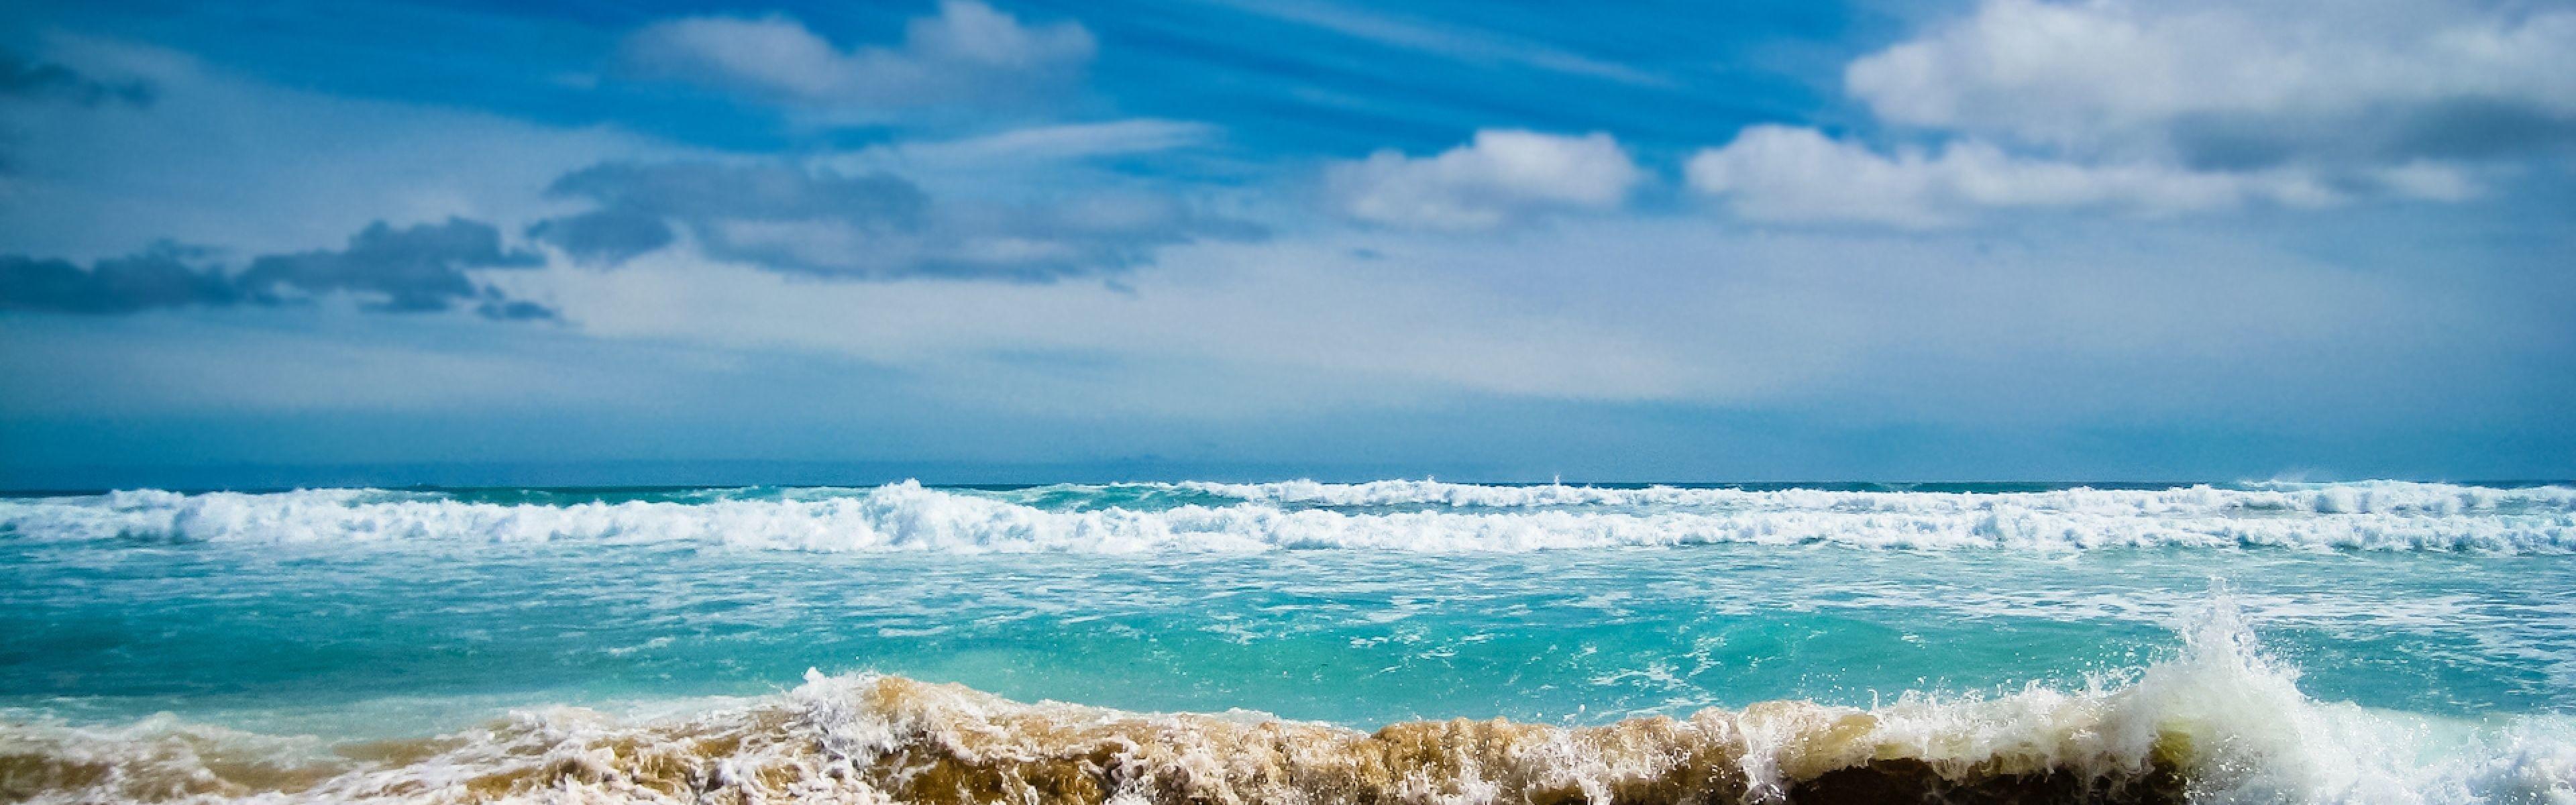 Res: 3840x1200, Beautiful Beach Scenery | Wallpapers Sea Ocean Blue Hd Beautiful Beach Scene  P Os Heavy